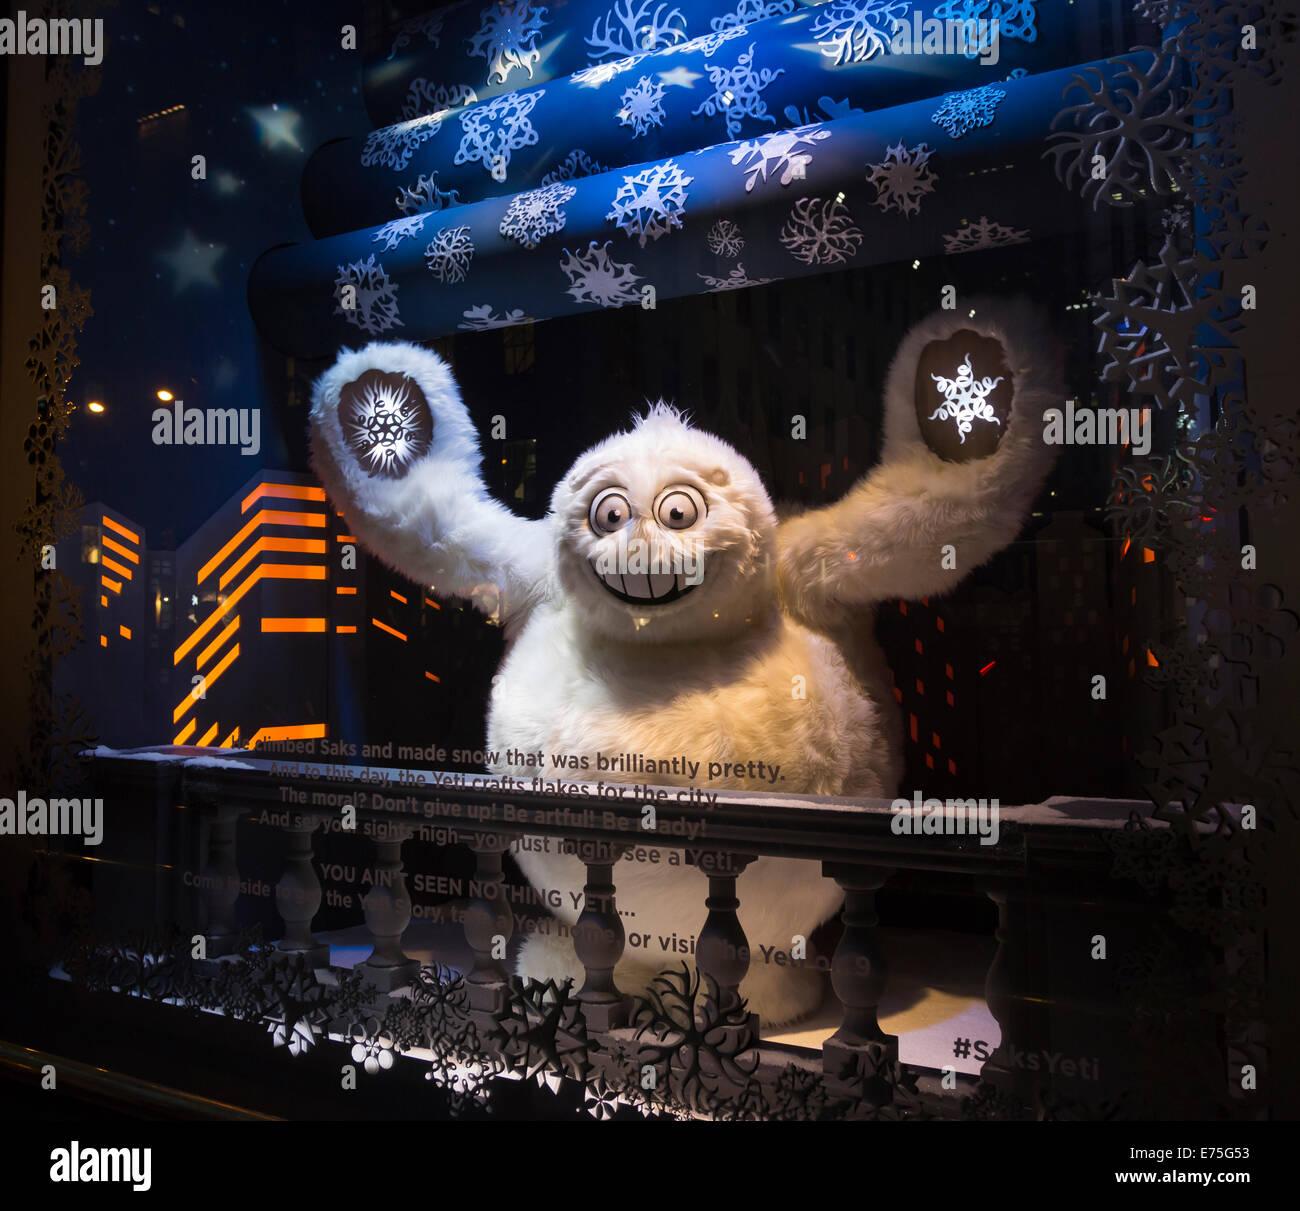 Christmas yeti in Saks Fifth Avenue traditional festive Christmas ...